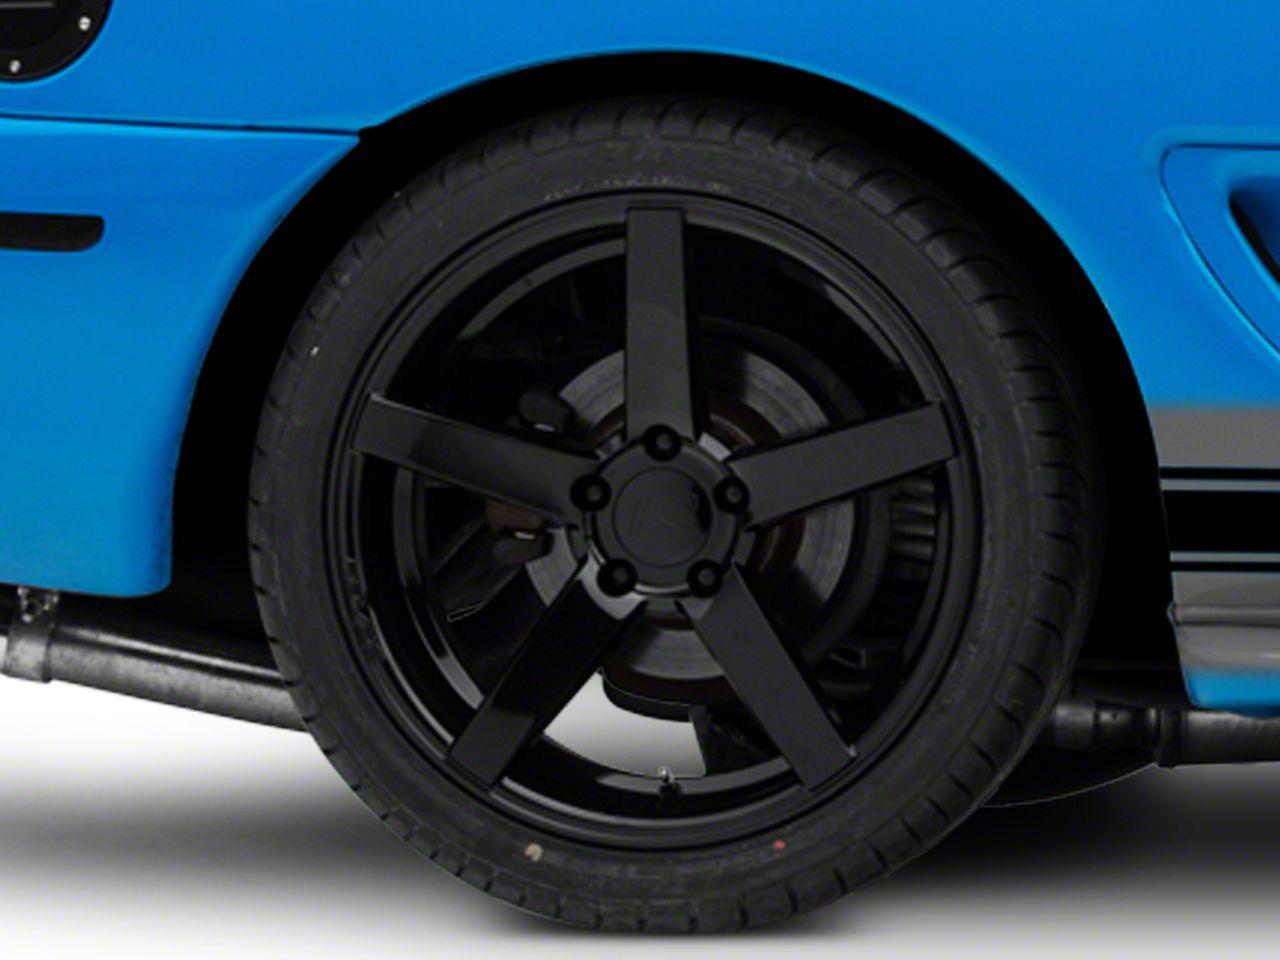 Rovos Durban Gloss Black Wheel - 18x10.5 - Rear Only (94-04 All)